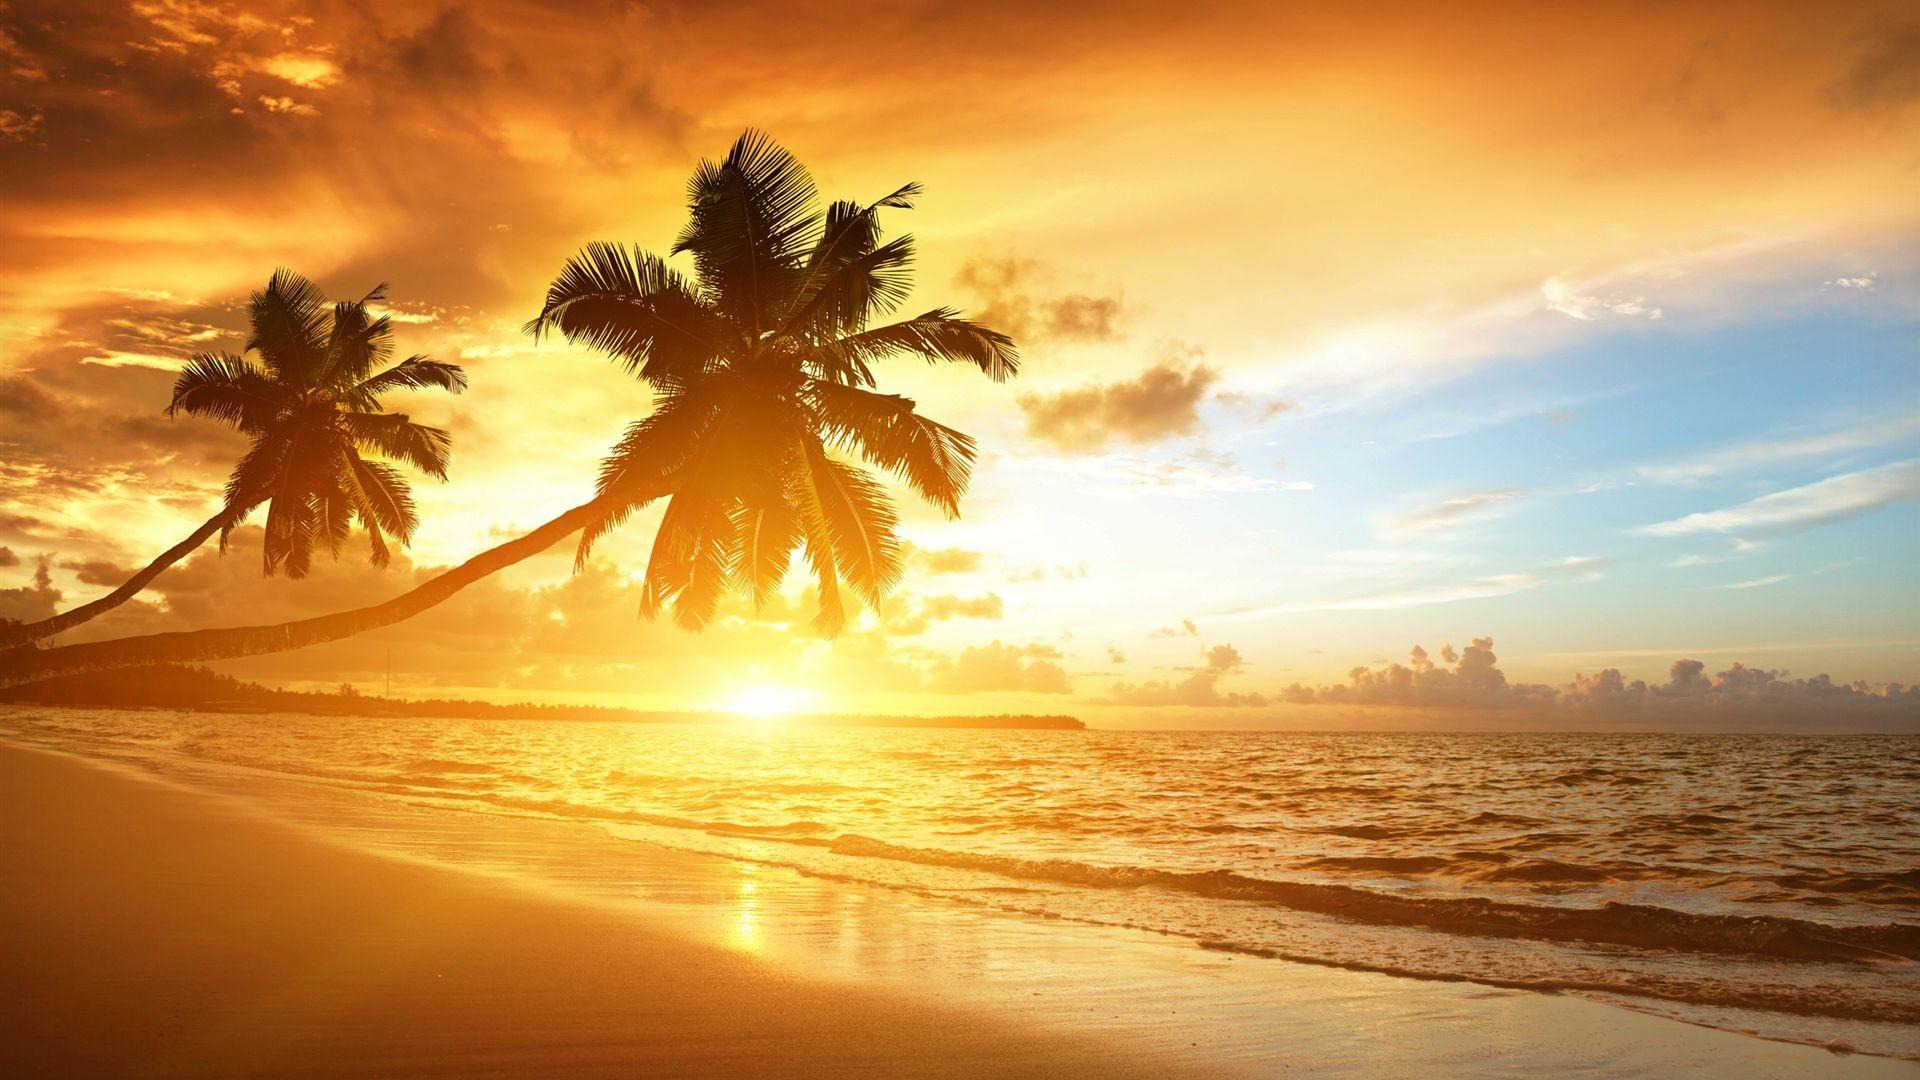 HD Beach Sunrise Beautiful Scenery Wallpaper Wallpapers – HD Desktop  Wallpaper